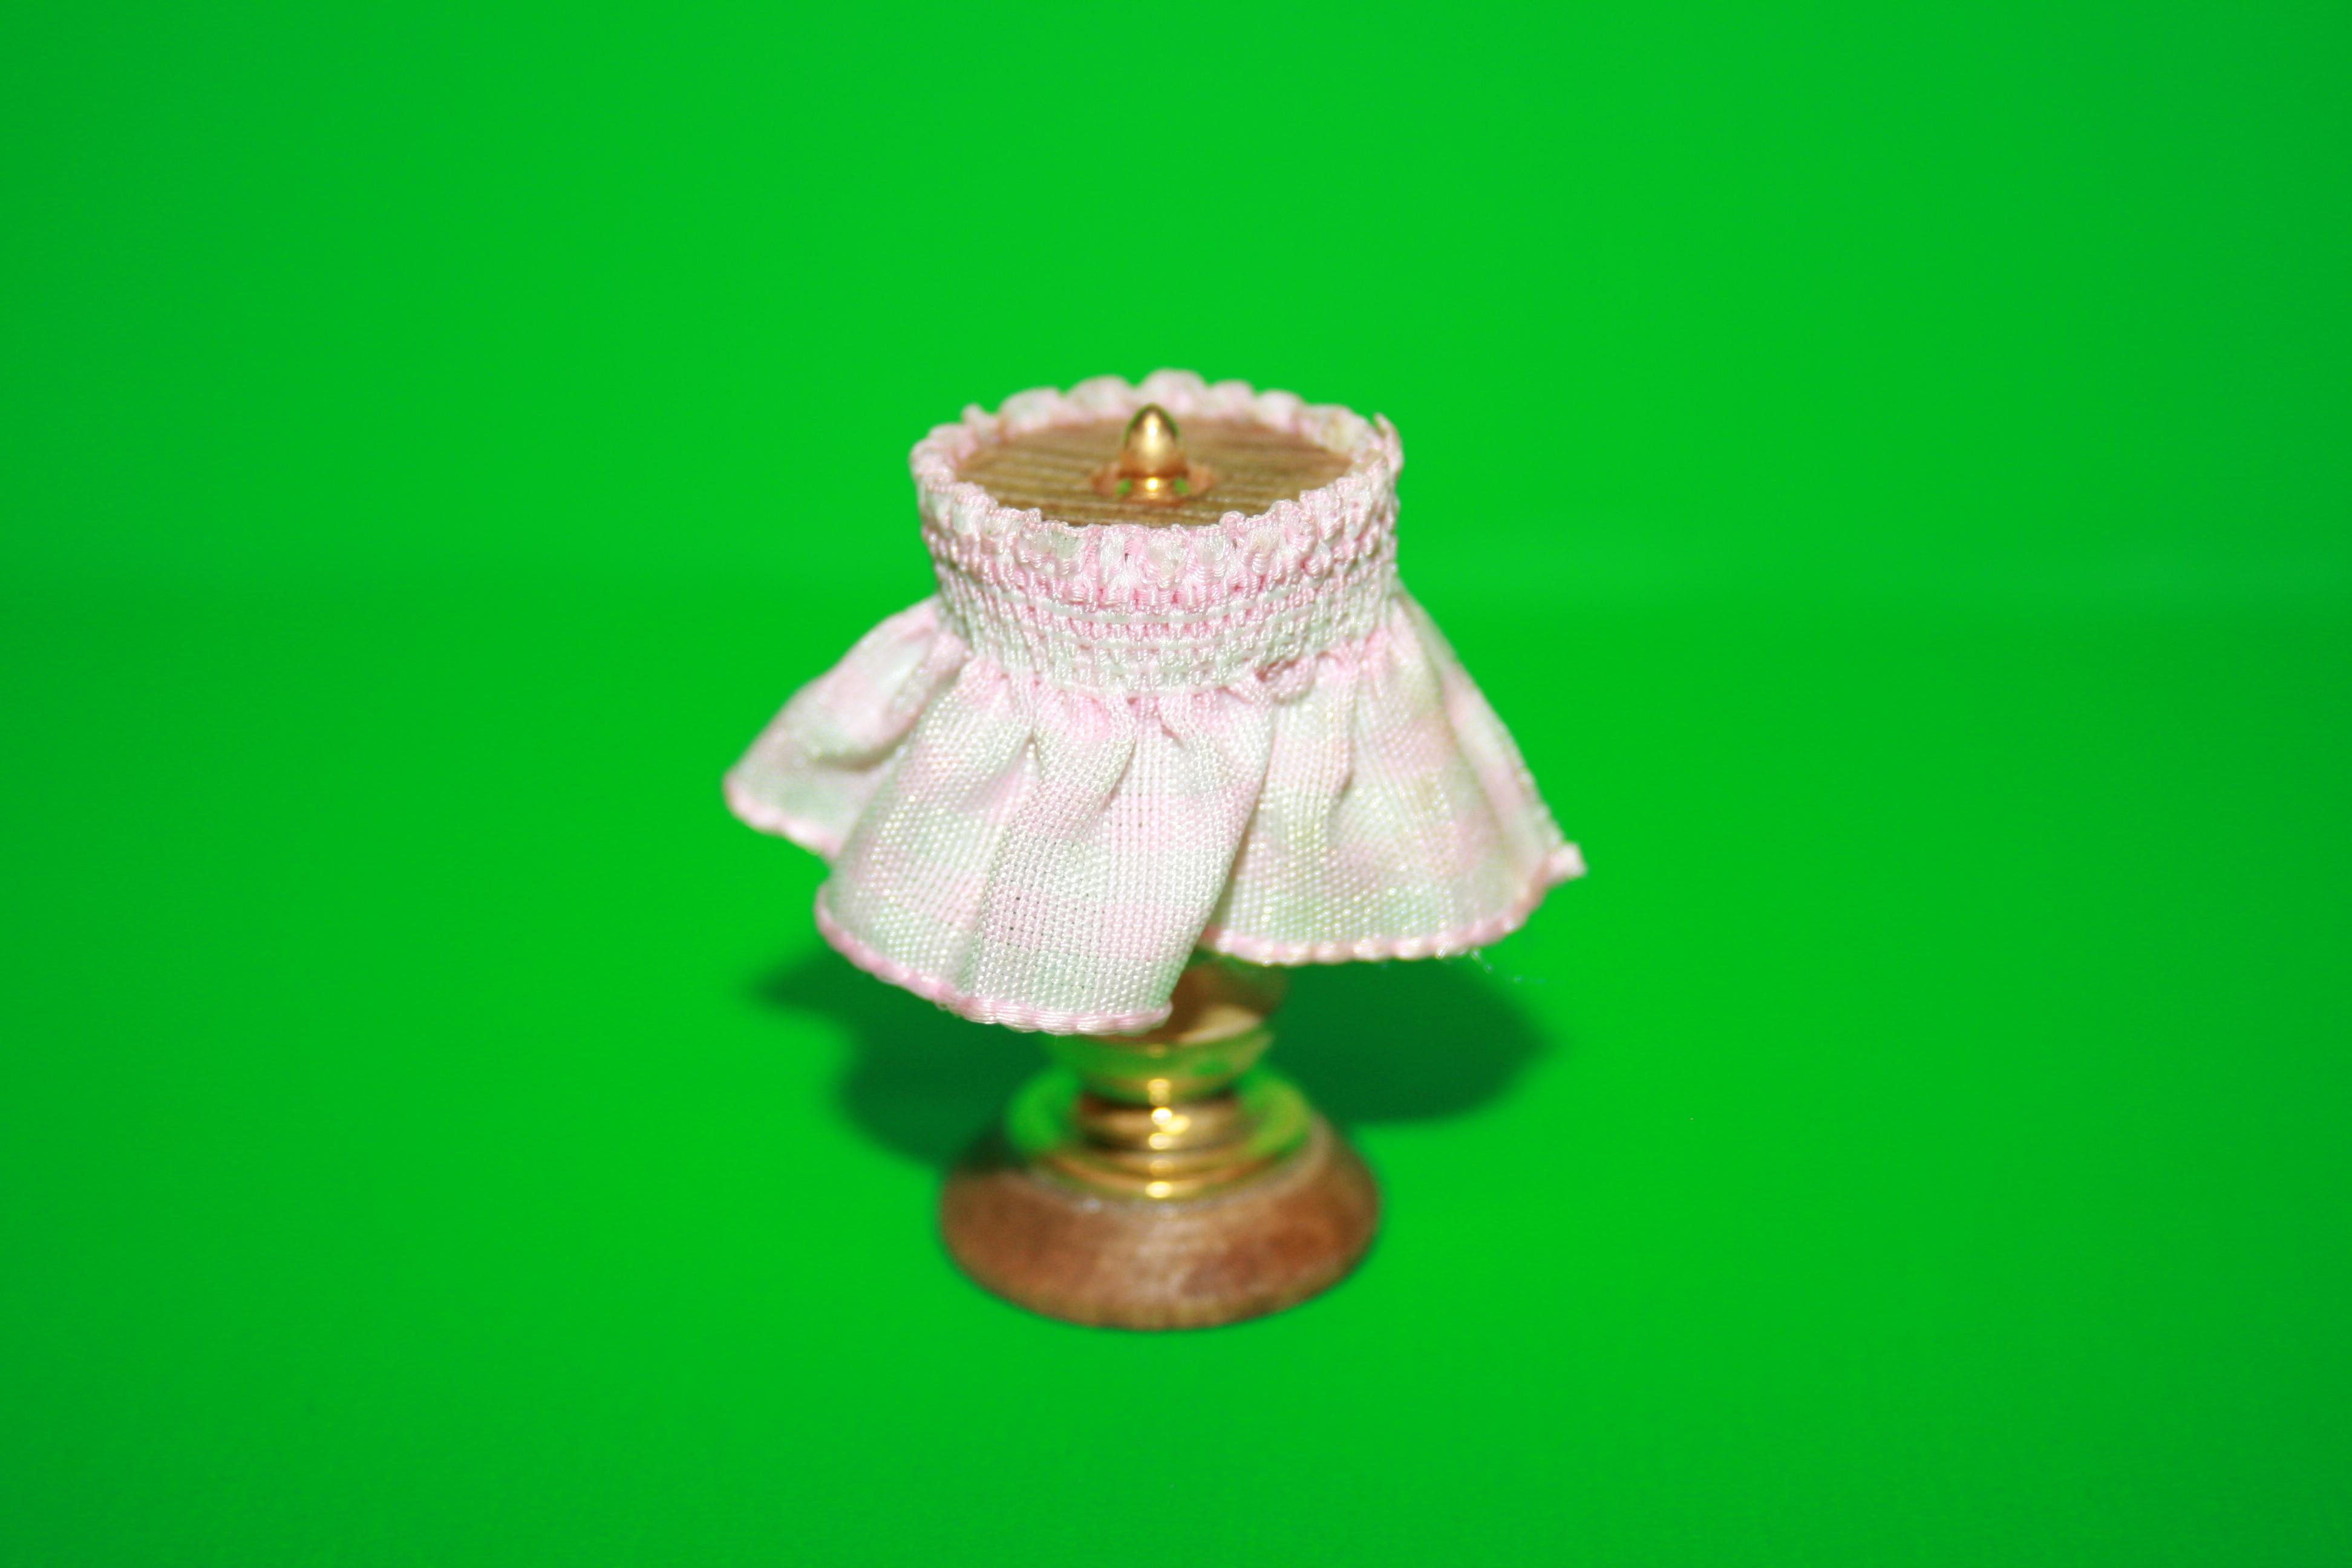 tischlampe wei rosa kariert ohne beleuchtung. Black Bedroom Furniture Sets. Home Design Ideas